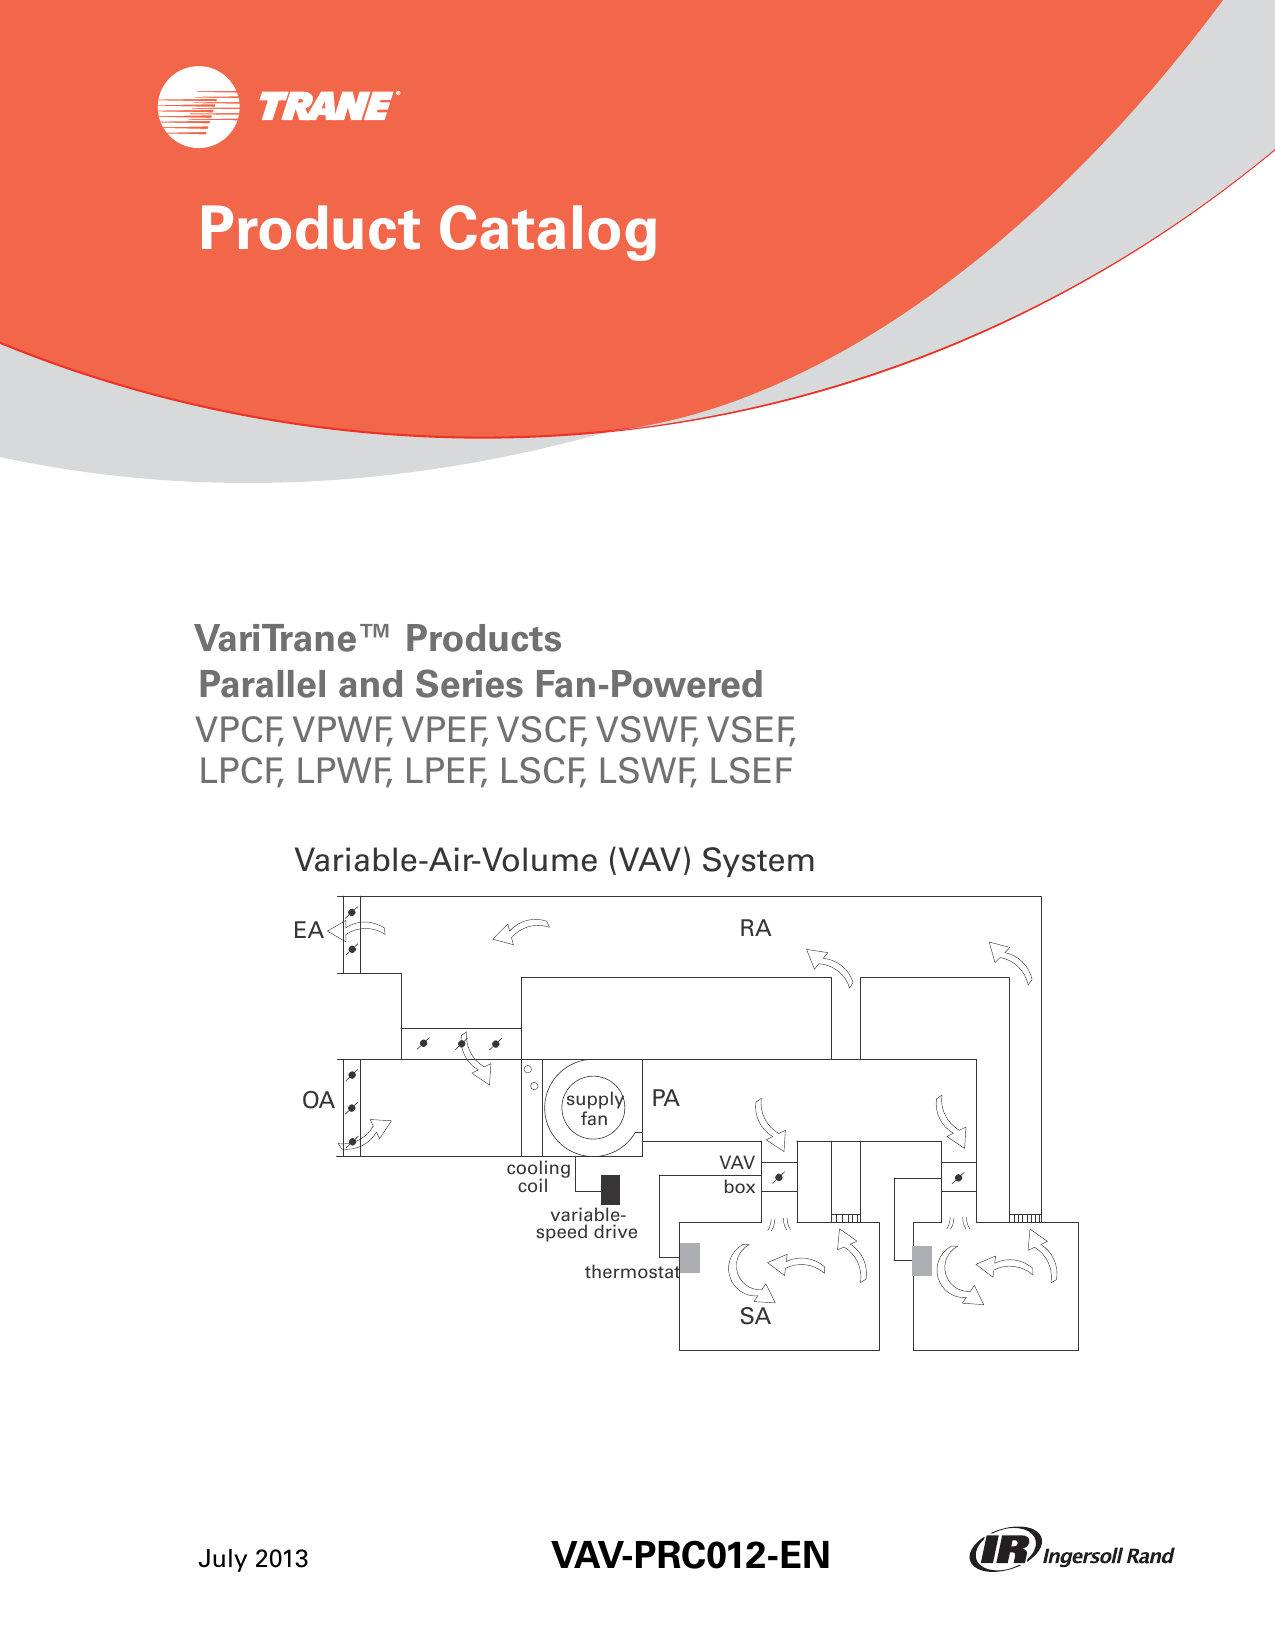 Trane Round In Out Catalogue Vav Prc012 En 072013 Wiring Diagrams Model Echalon